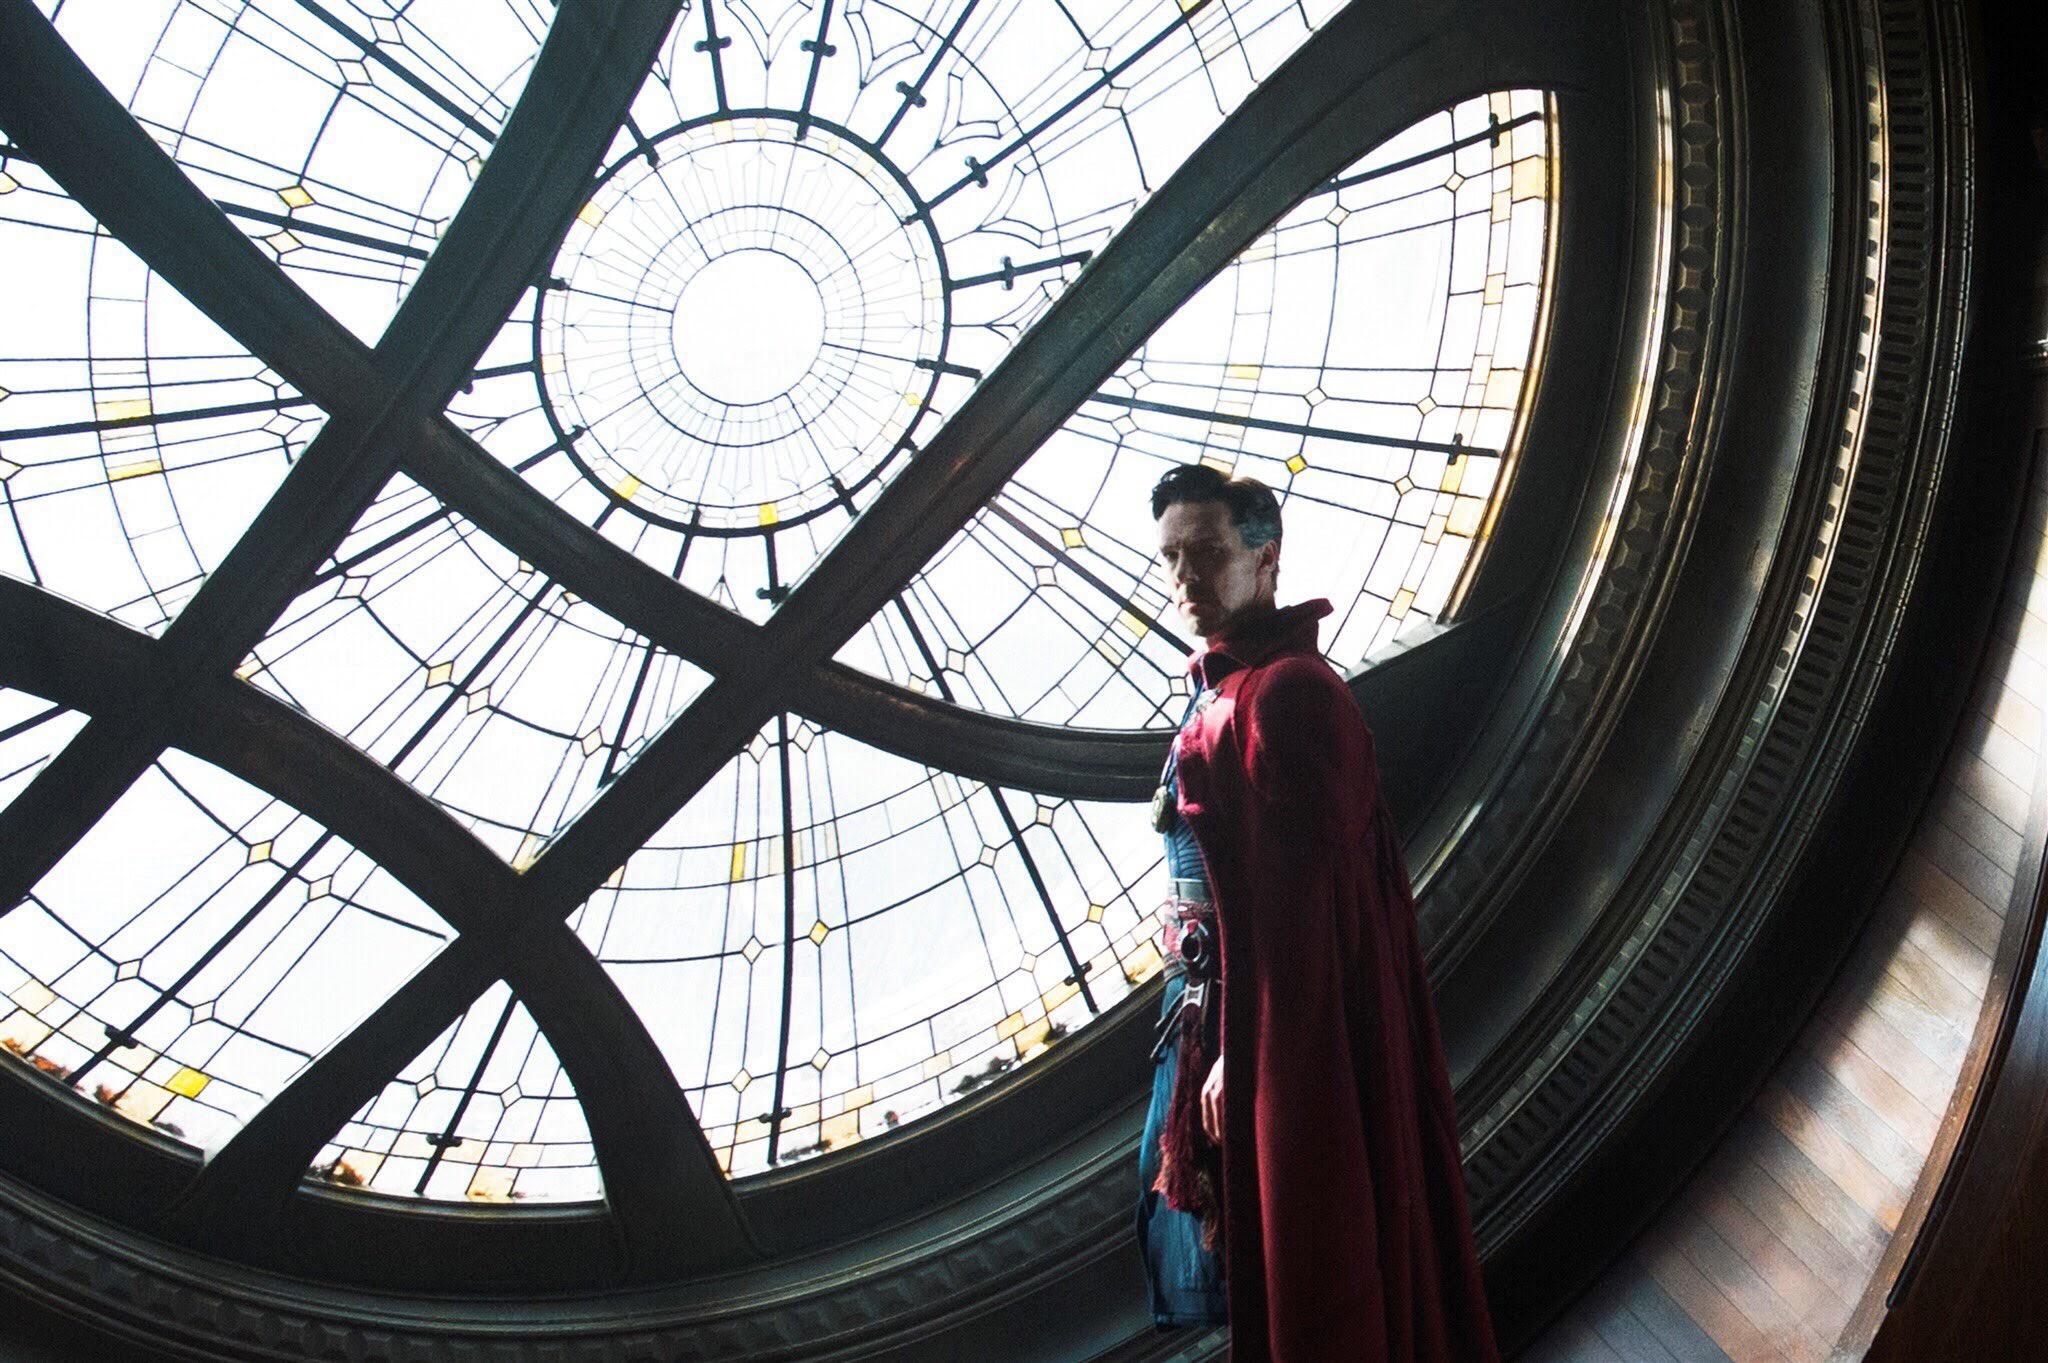 Doctor Strange 2:「アベンジャーズ: エンドゲーム」でも大活躍のベネディクト・カンバーバッチのヒーローが帰ってくる待望の続編「ドクター・ストレンジ 2」が撮影を開始する時期と場所が伝えられた ! !